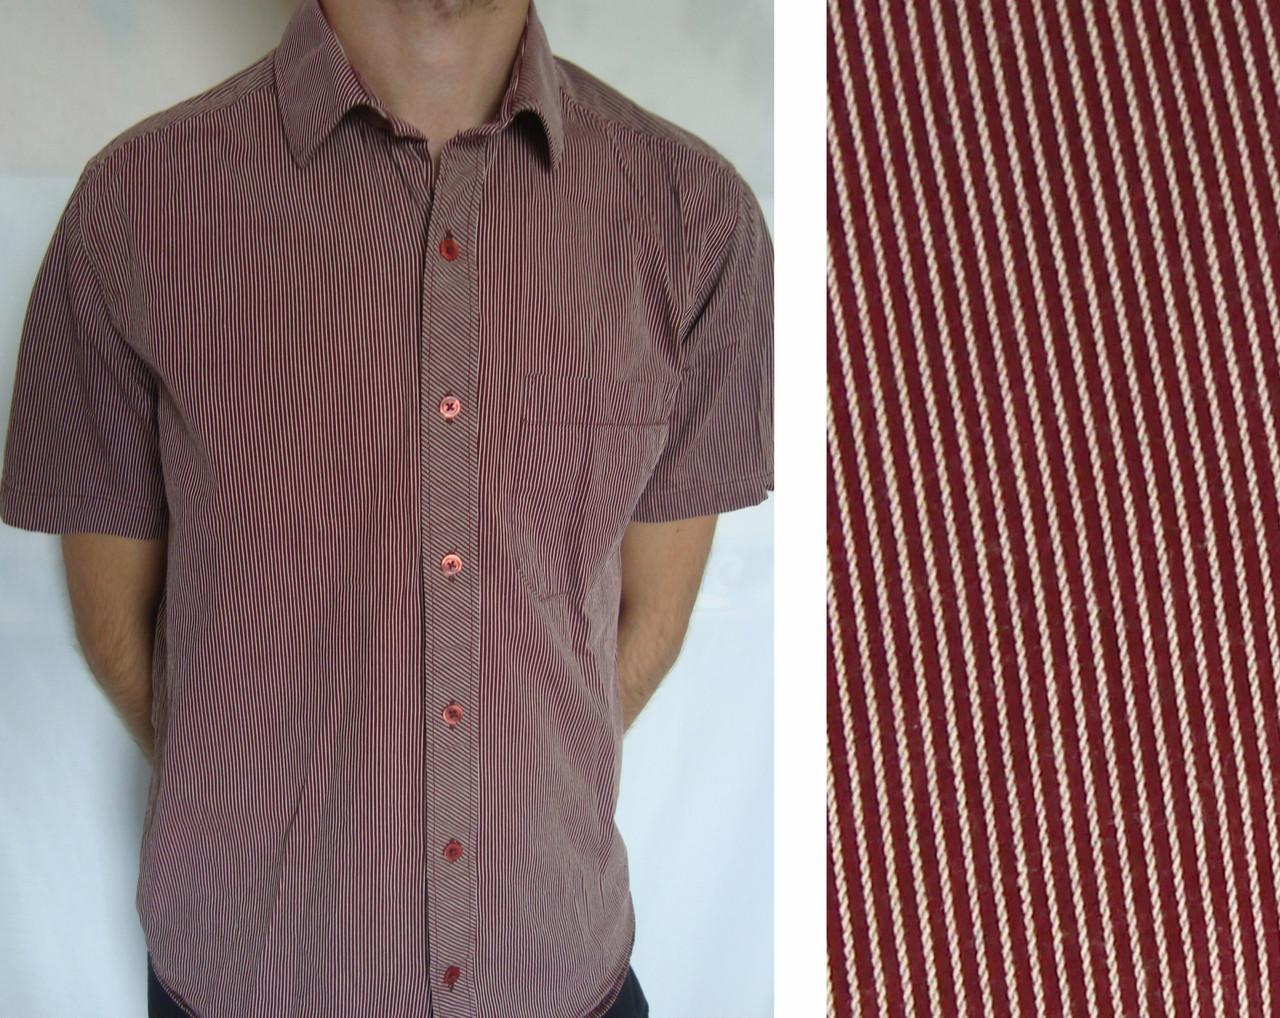 Новая рубашка размер S-M сорочка нова